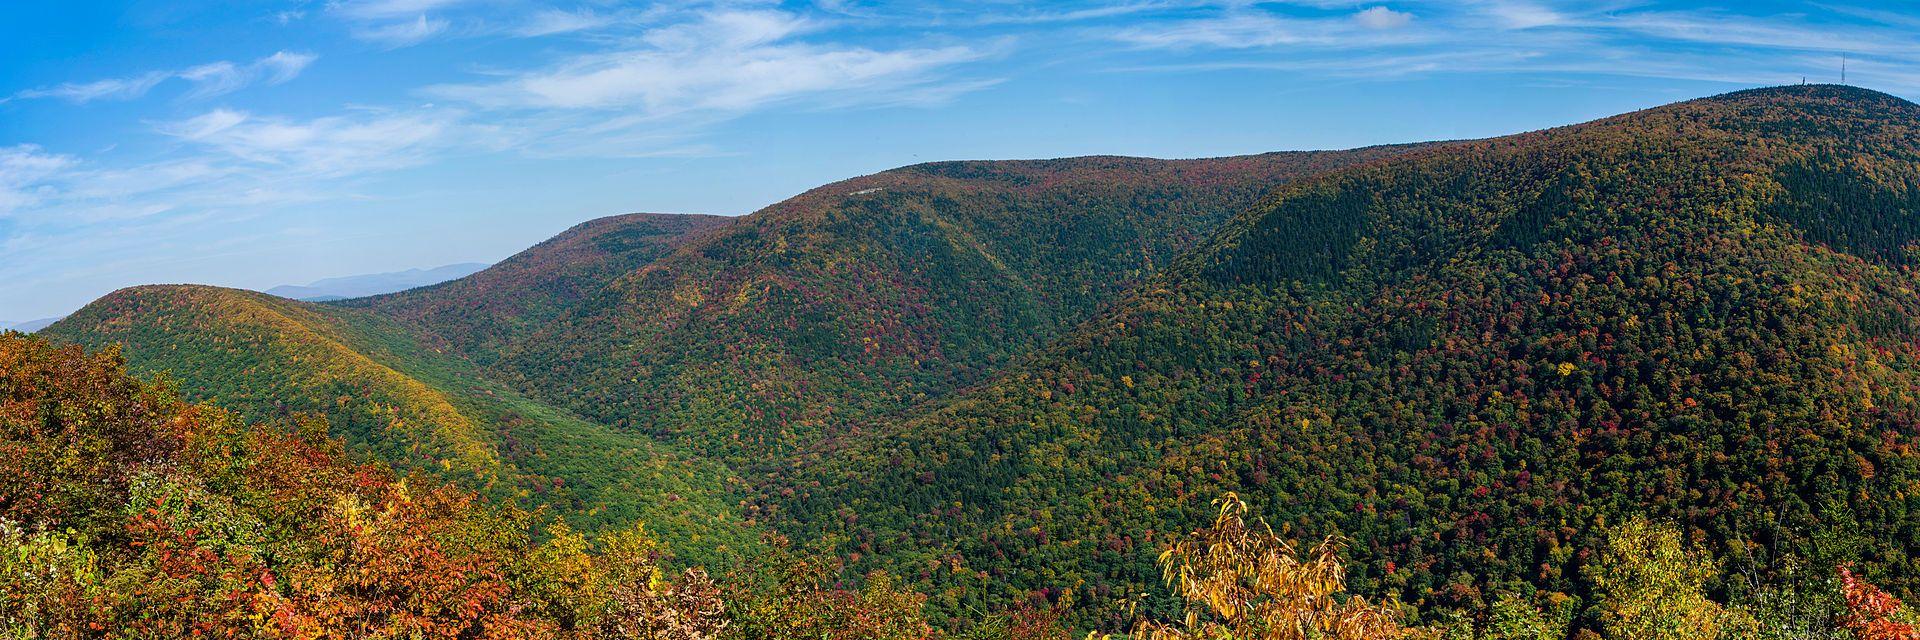 Mount Greylock The Tallest Peak In Massachusetts Oc 2000x700 Landscape Photographers Natural Landmarks Welcome To Hogwarts